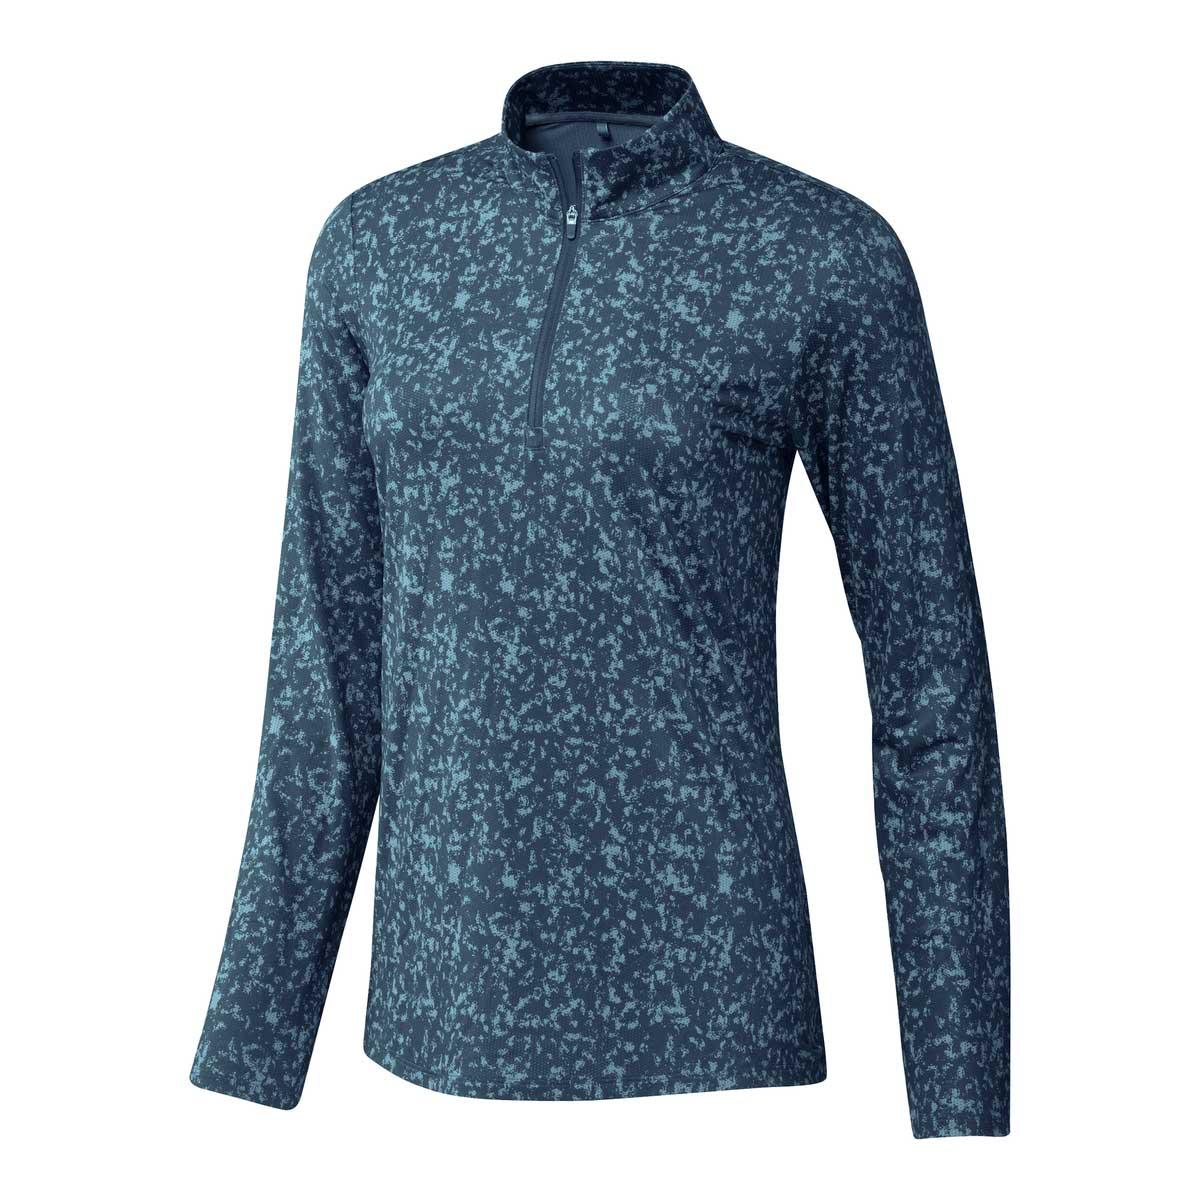 Adidas Women's Aeroready UV50 Primegreen Hazy Sky/Crew Navy Longsleeve Shirt